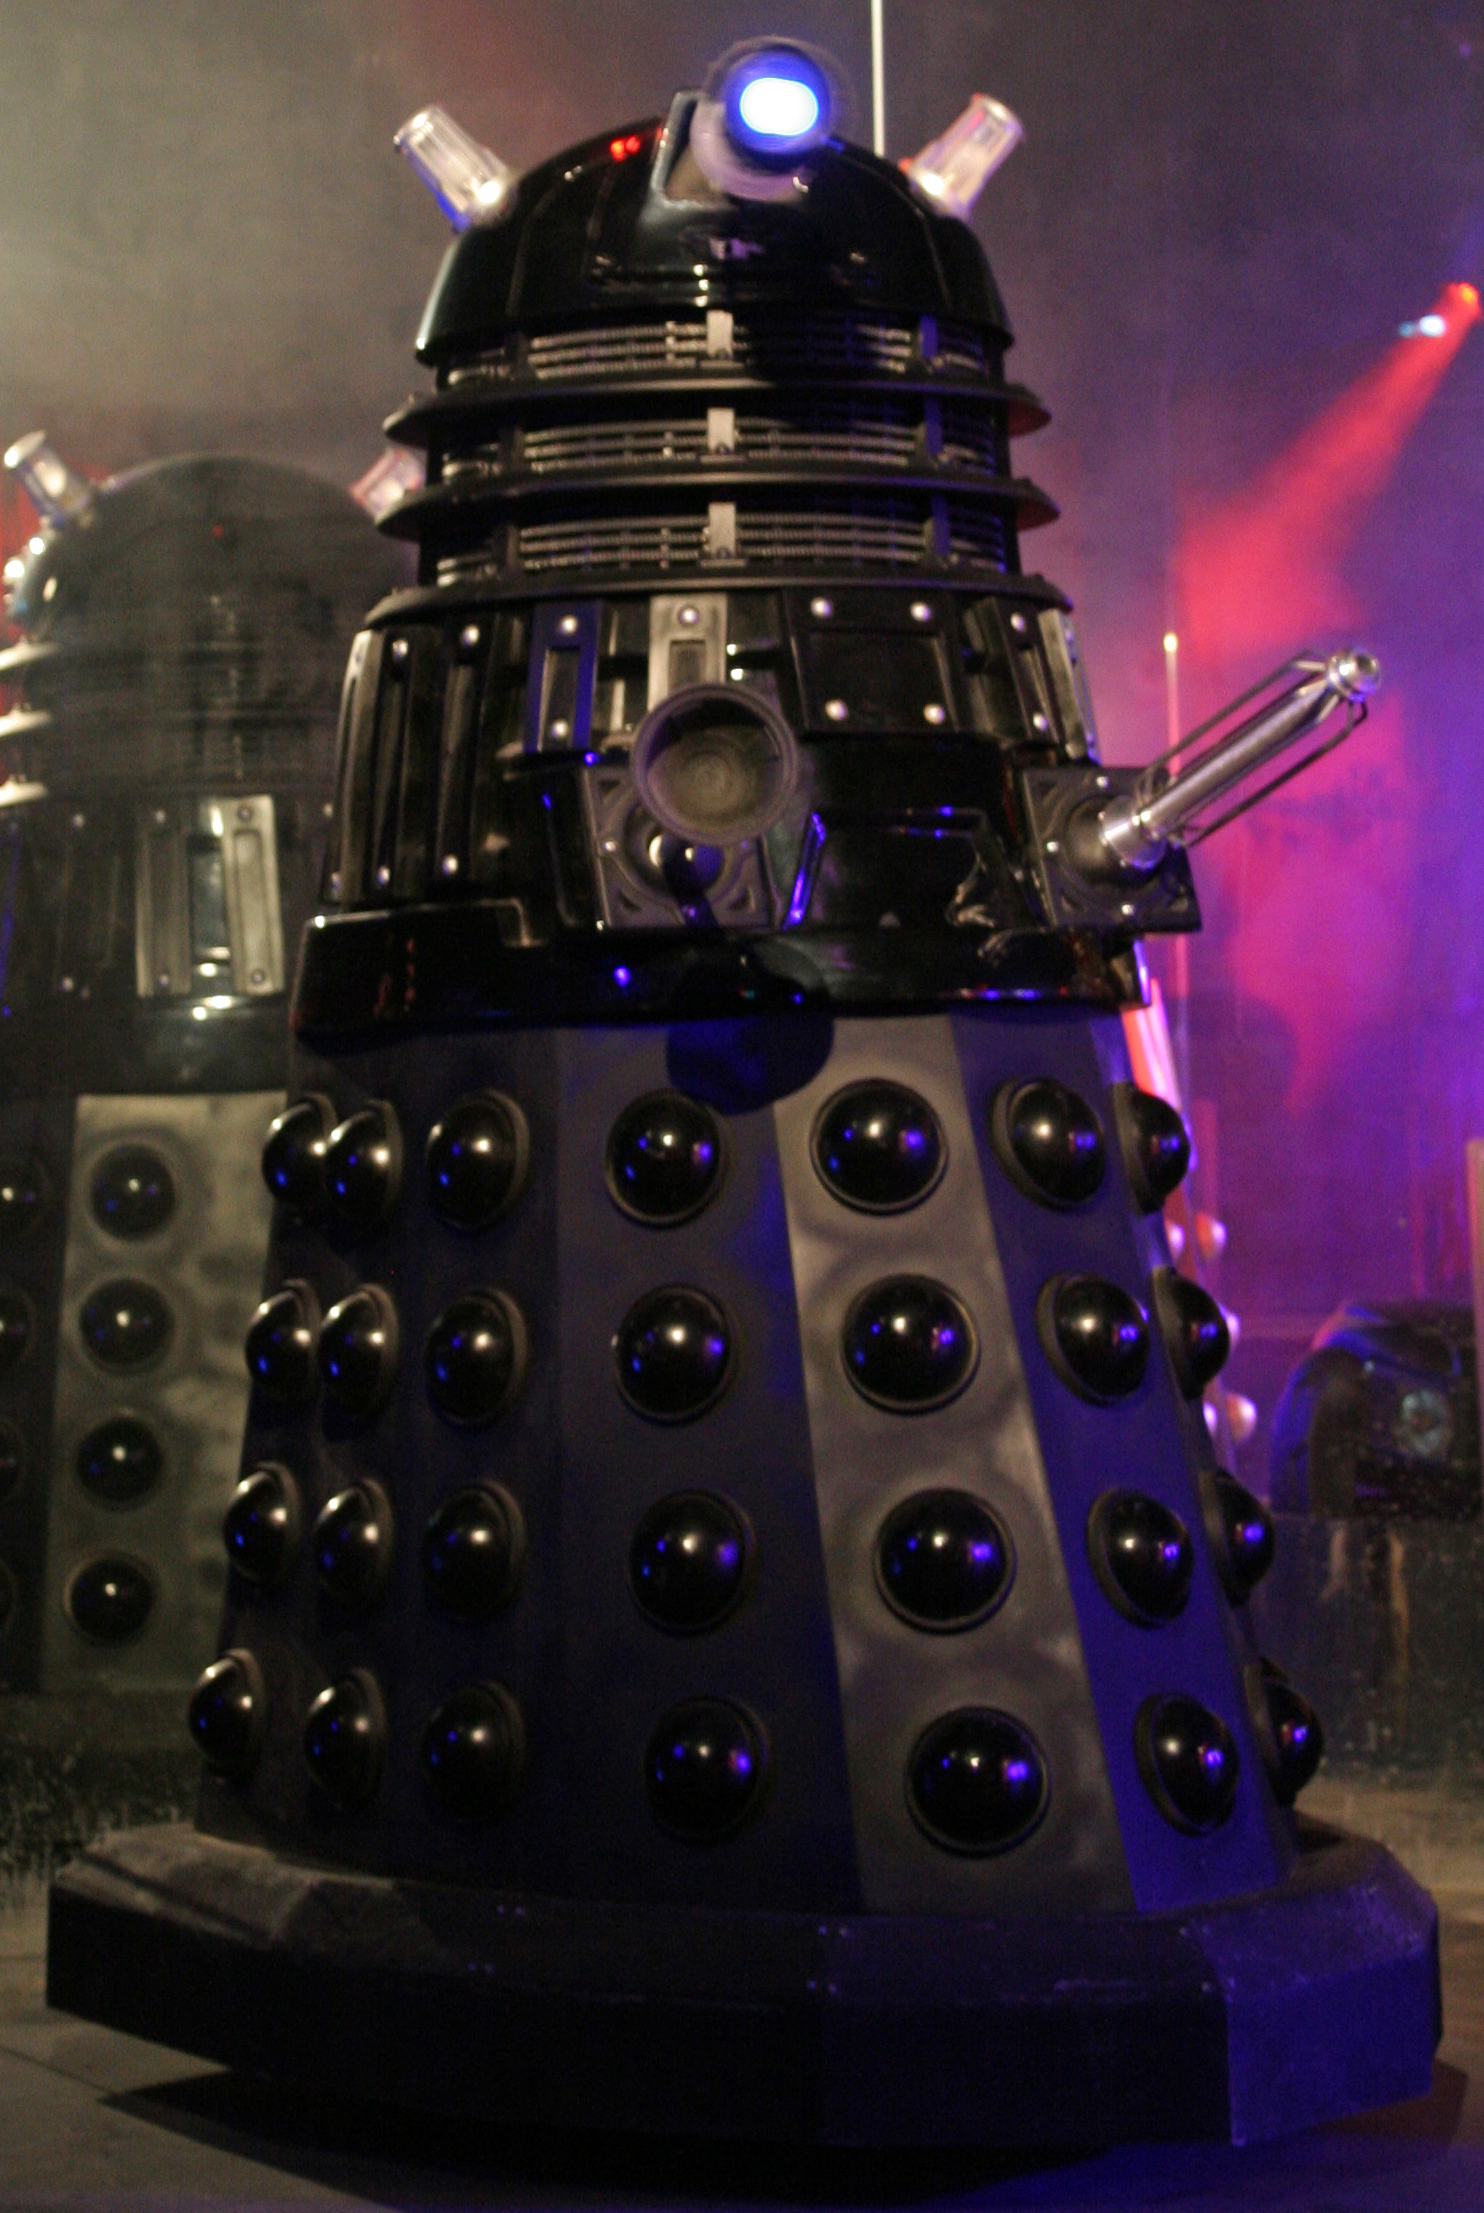 File:Dalek (Dr Who).jpg - Wikimedia Commons  File:Dalek (Dr ...